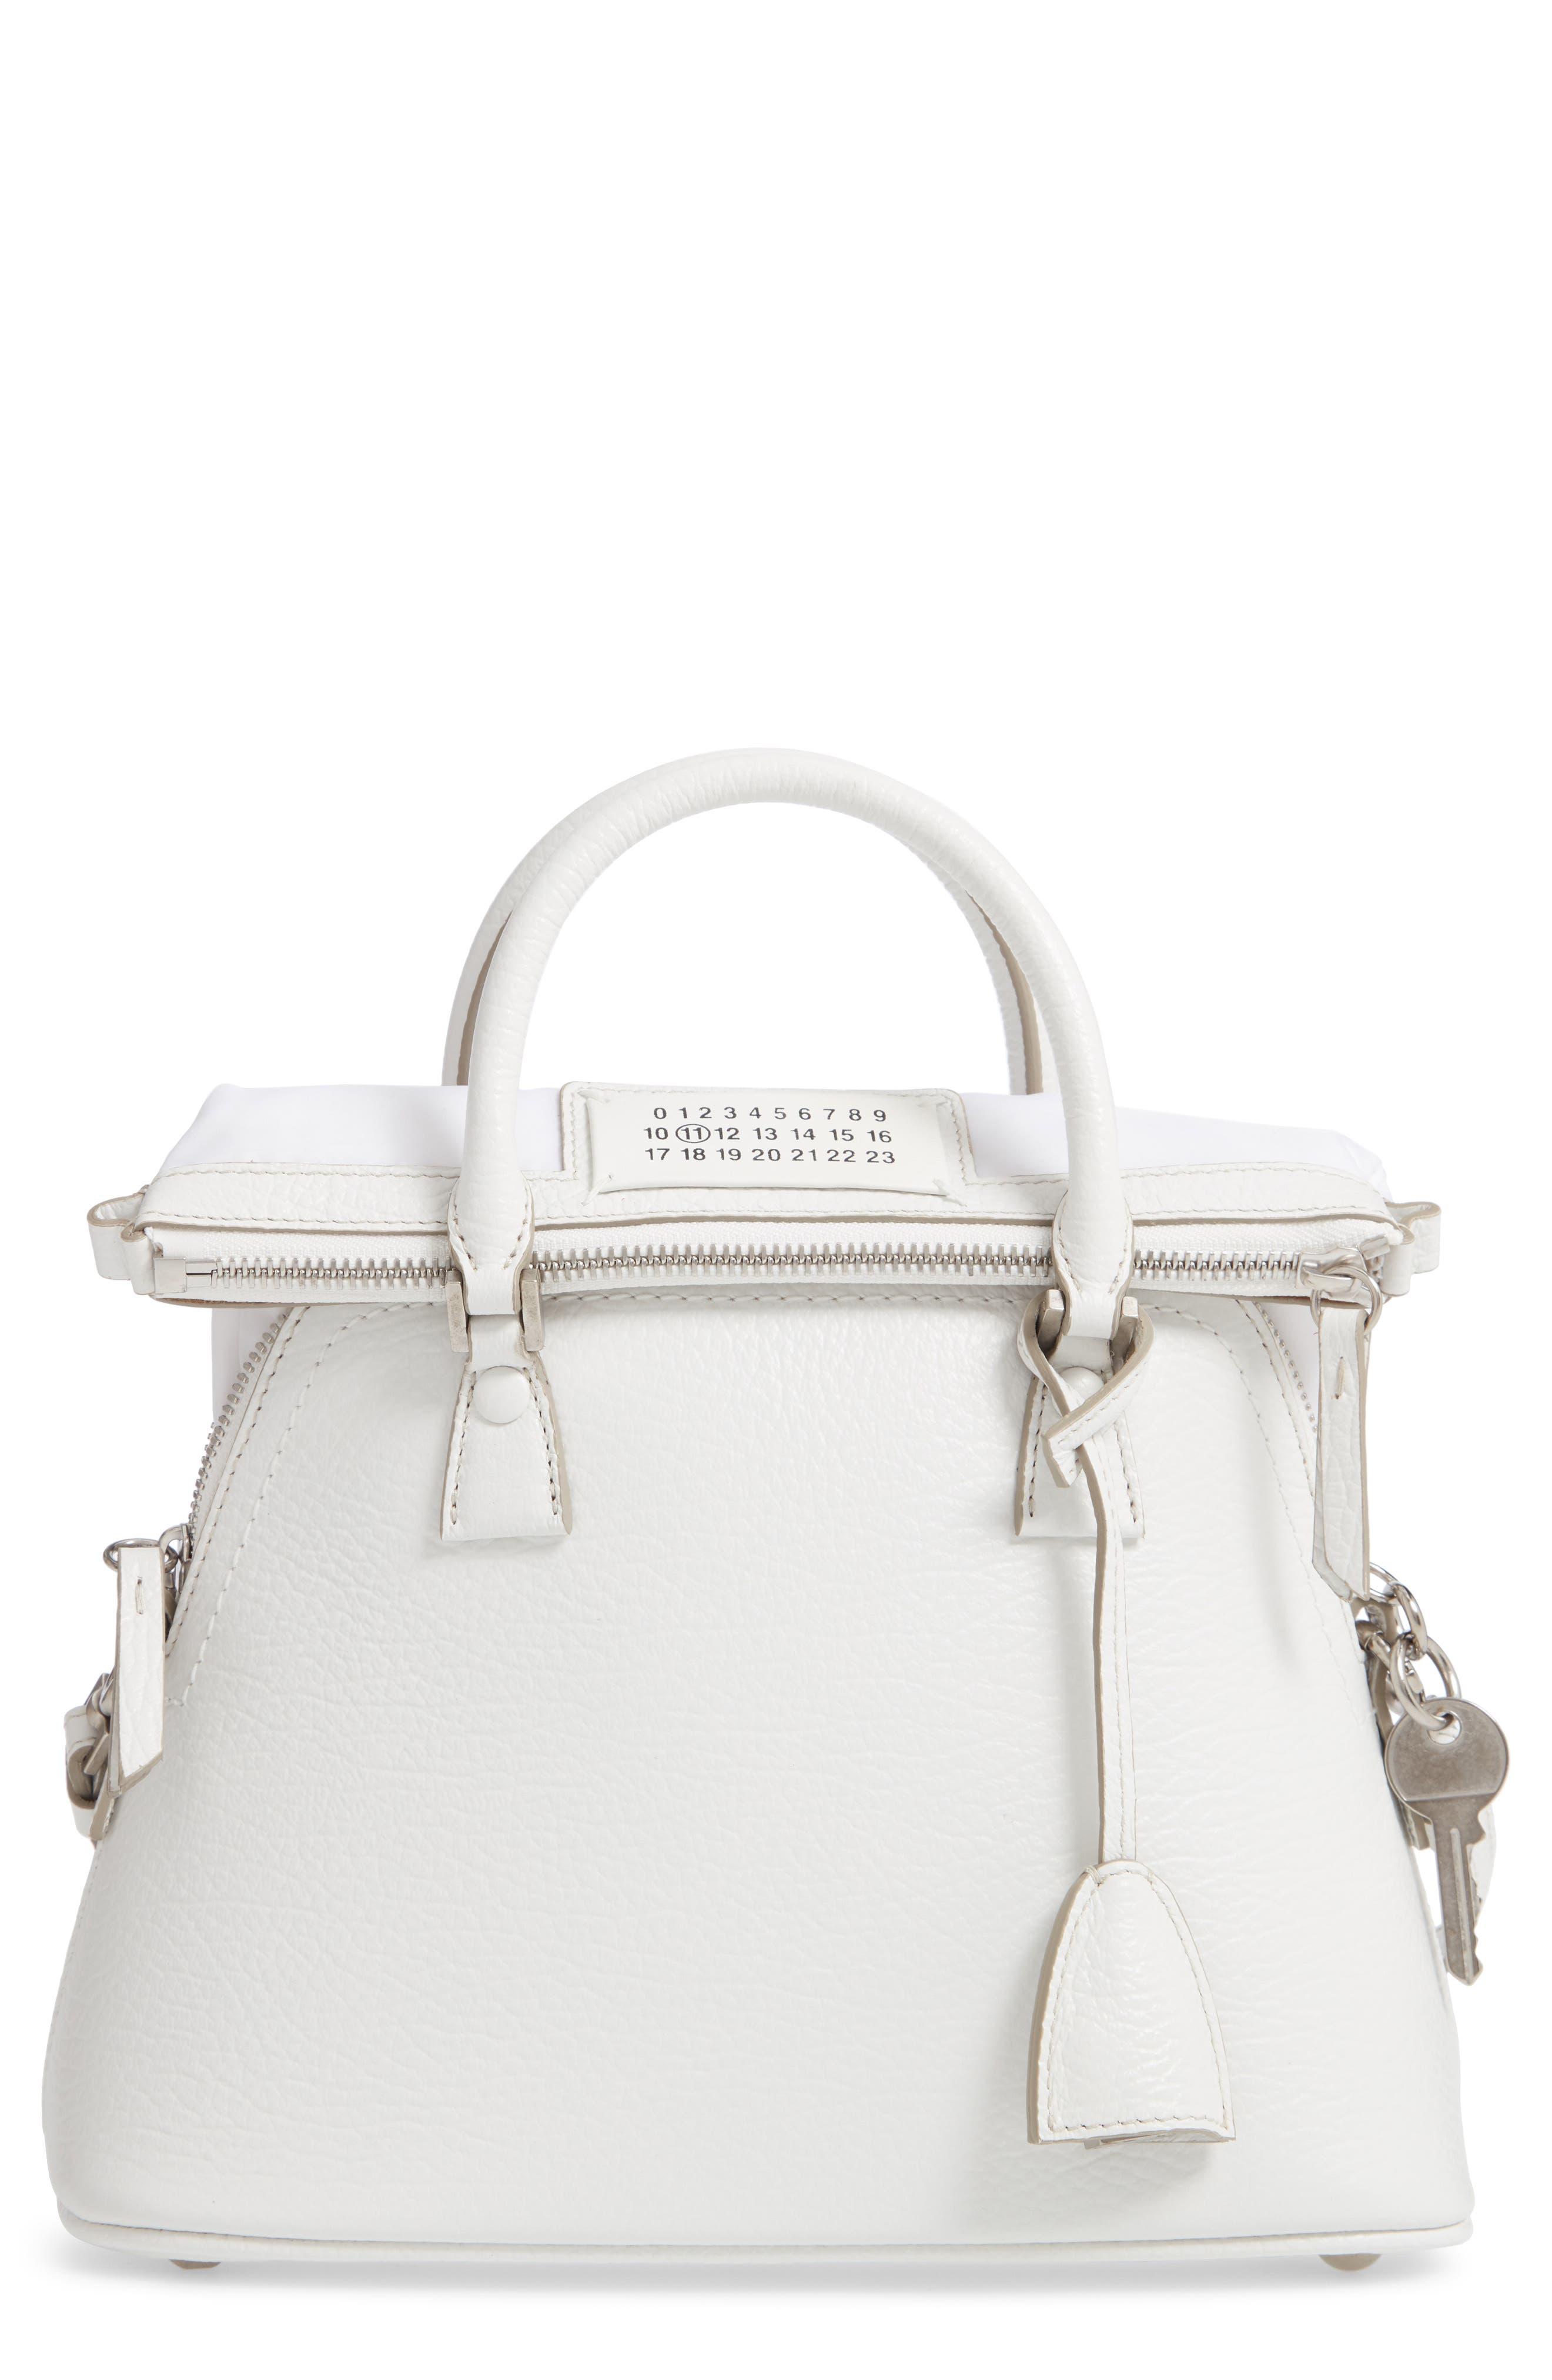 Small 5AC Calfskin Leather Handbag,                             Main thumbnail 1, color,                             WHITE